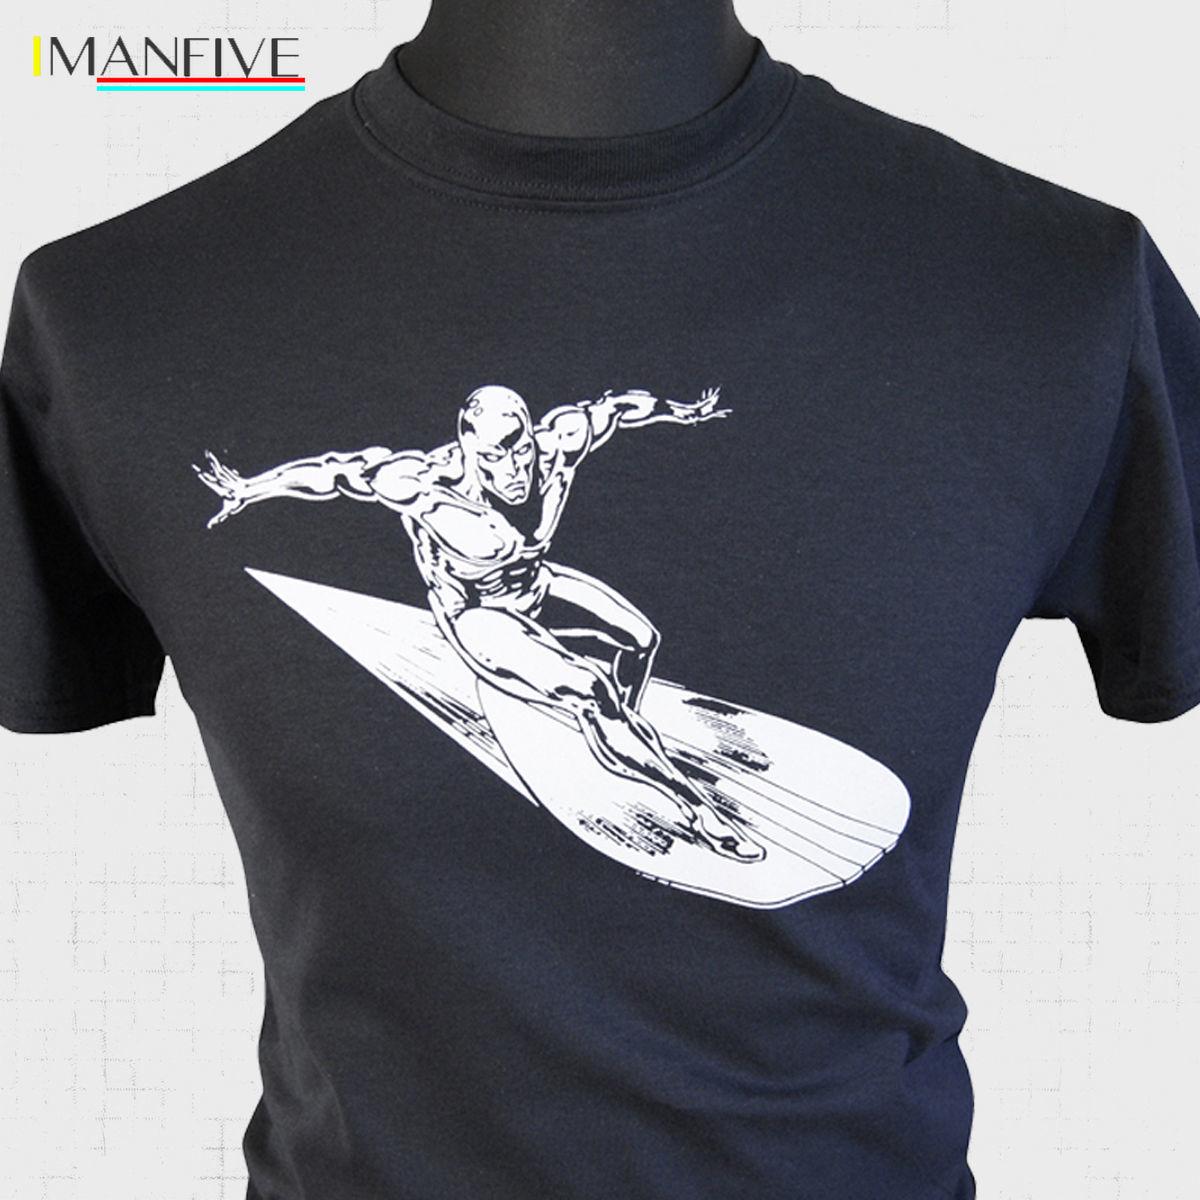 The Silver Surfer T Shirt Fantastic Four Retro Comic Super hero Sci Fi New T Shirts Funny Tops Tee New Unisex Funny Tops in T Shirts from Men 39 s Clothing